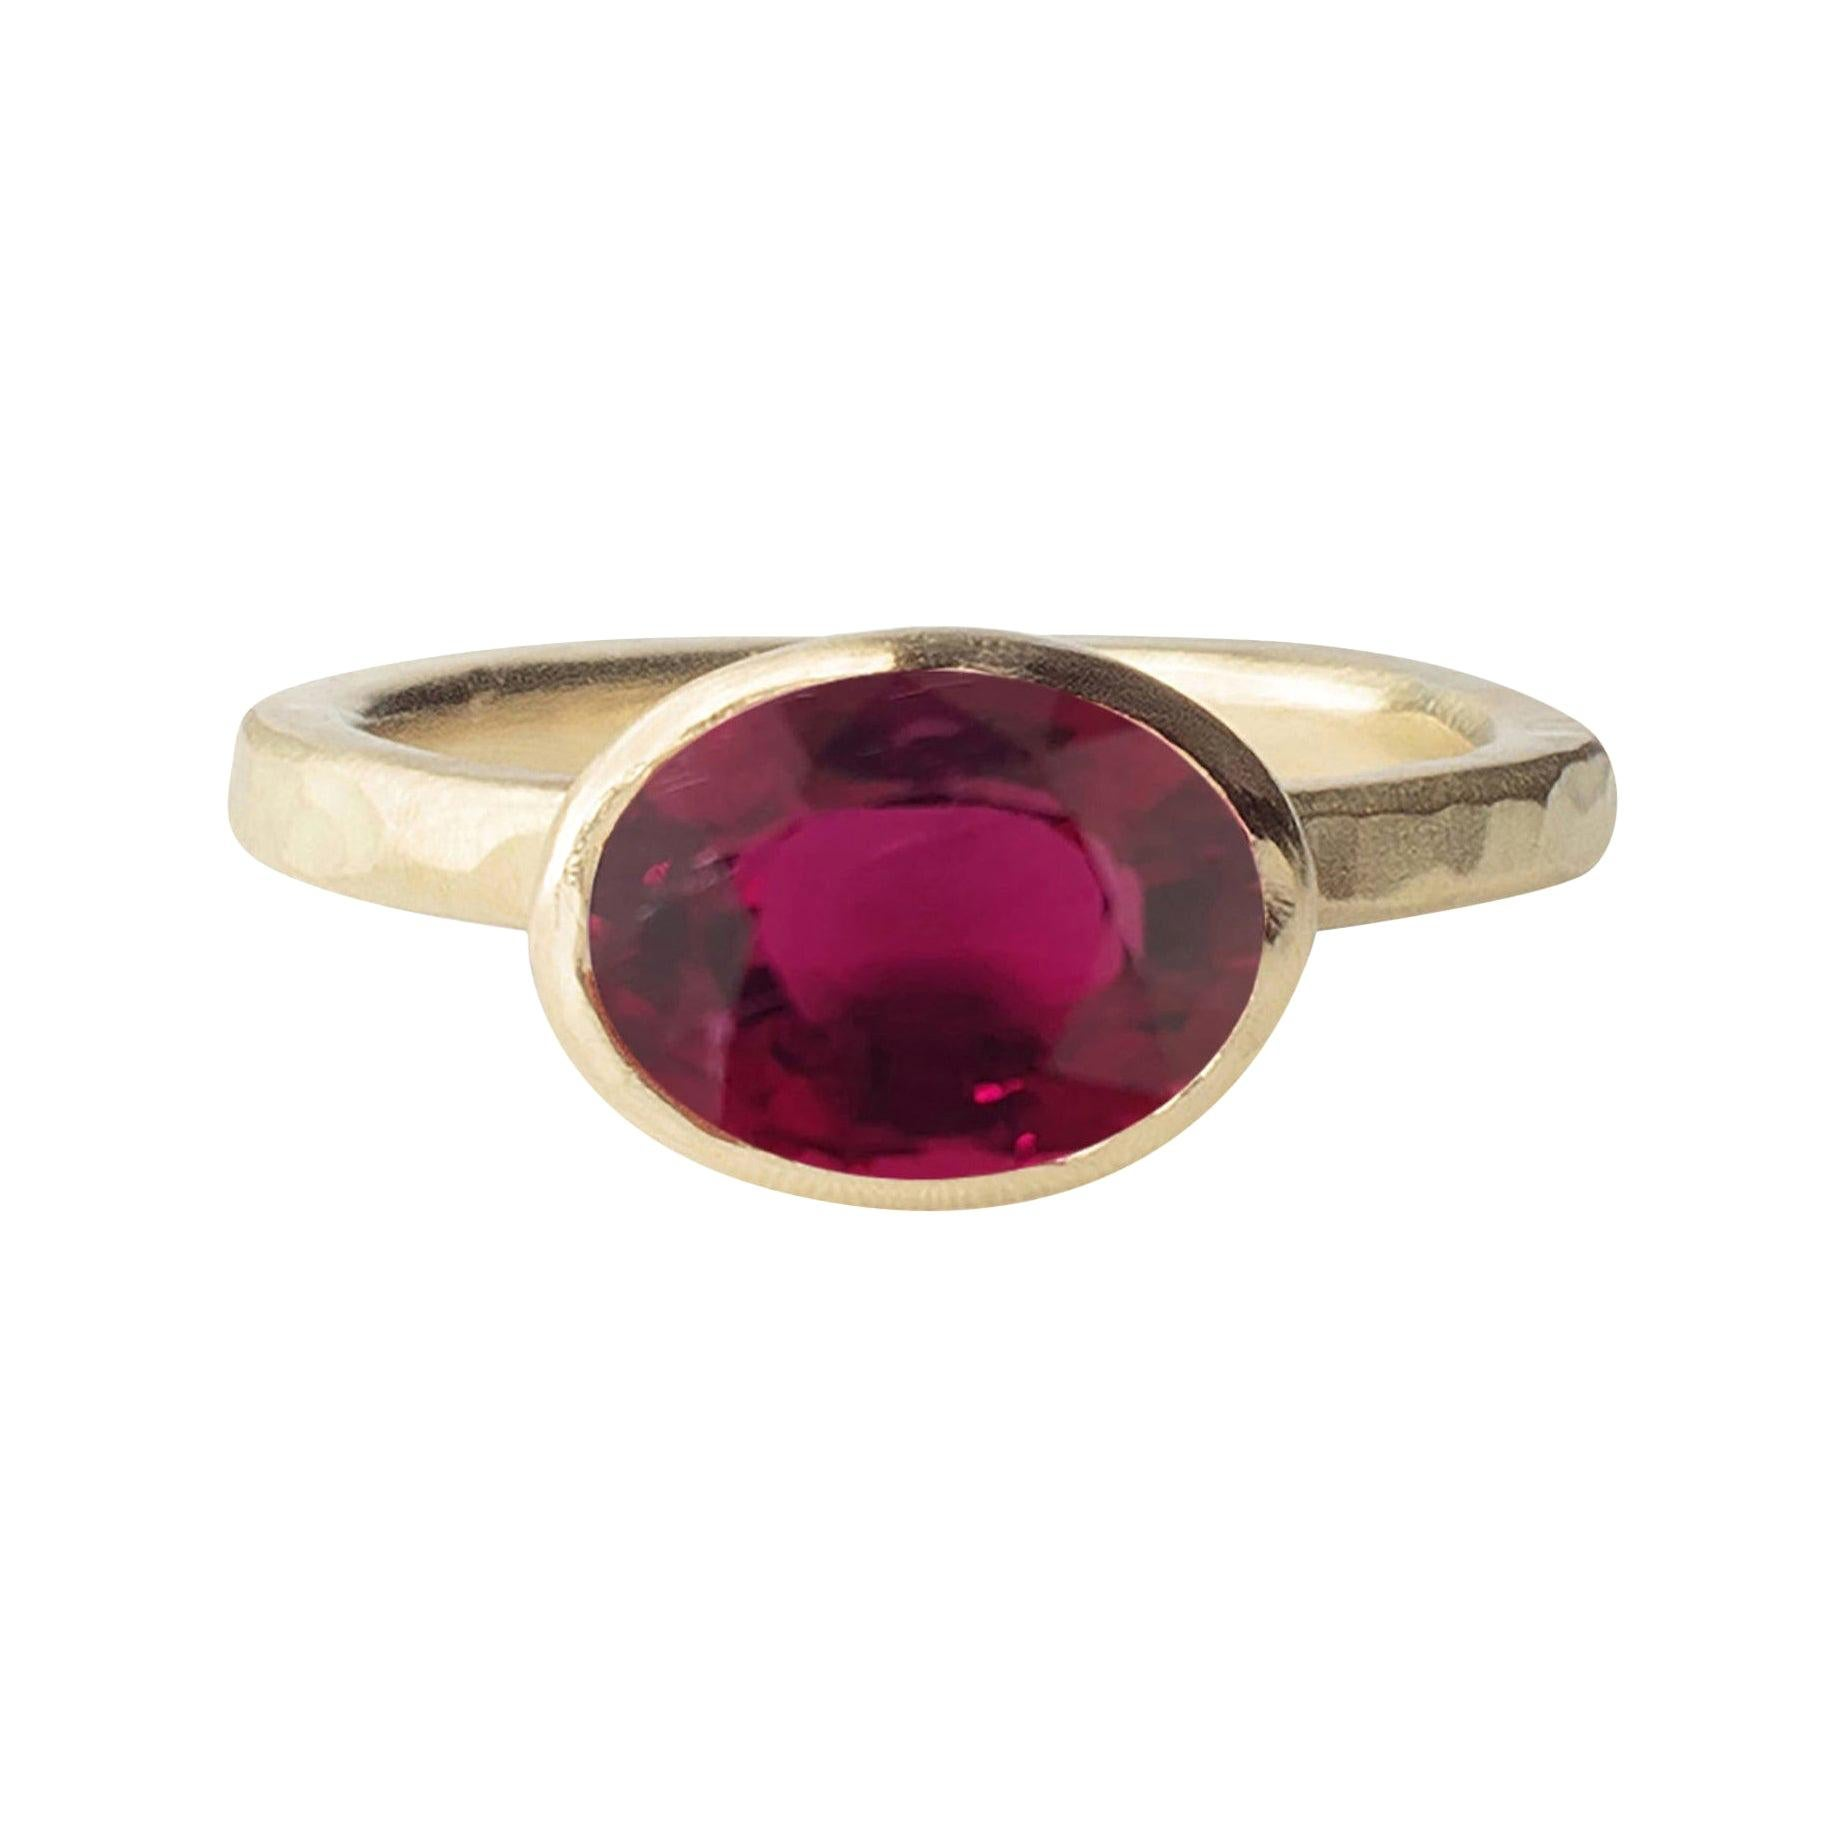 Deborah Murdoch 18 Karat Yellow Gold Oval Rich Pink Tourmaline Cocktail Ring